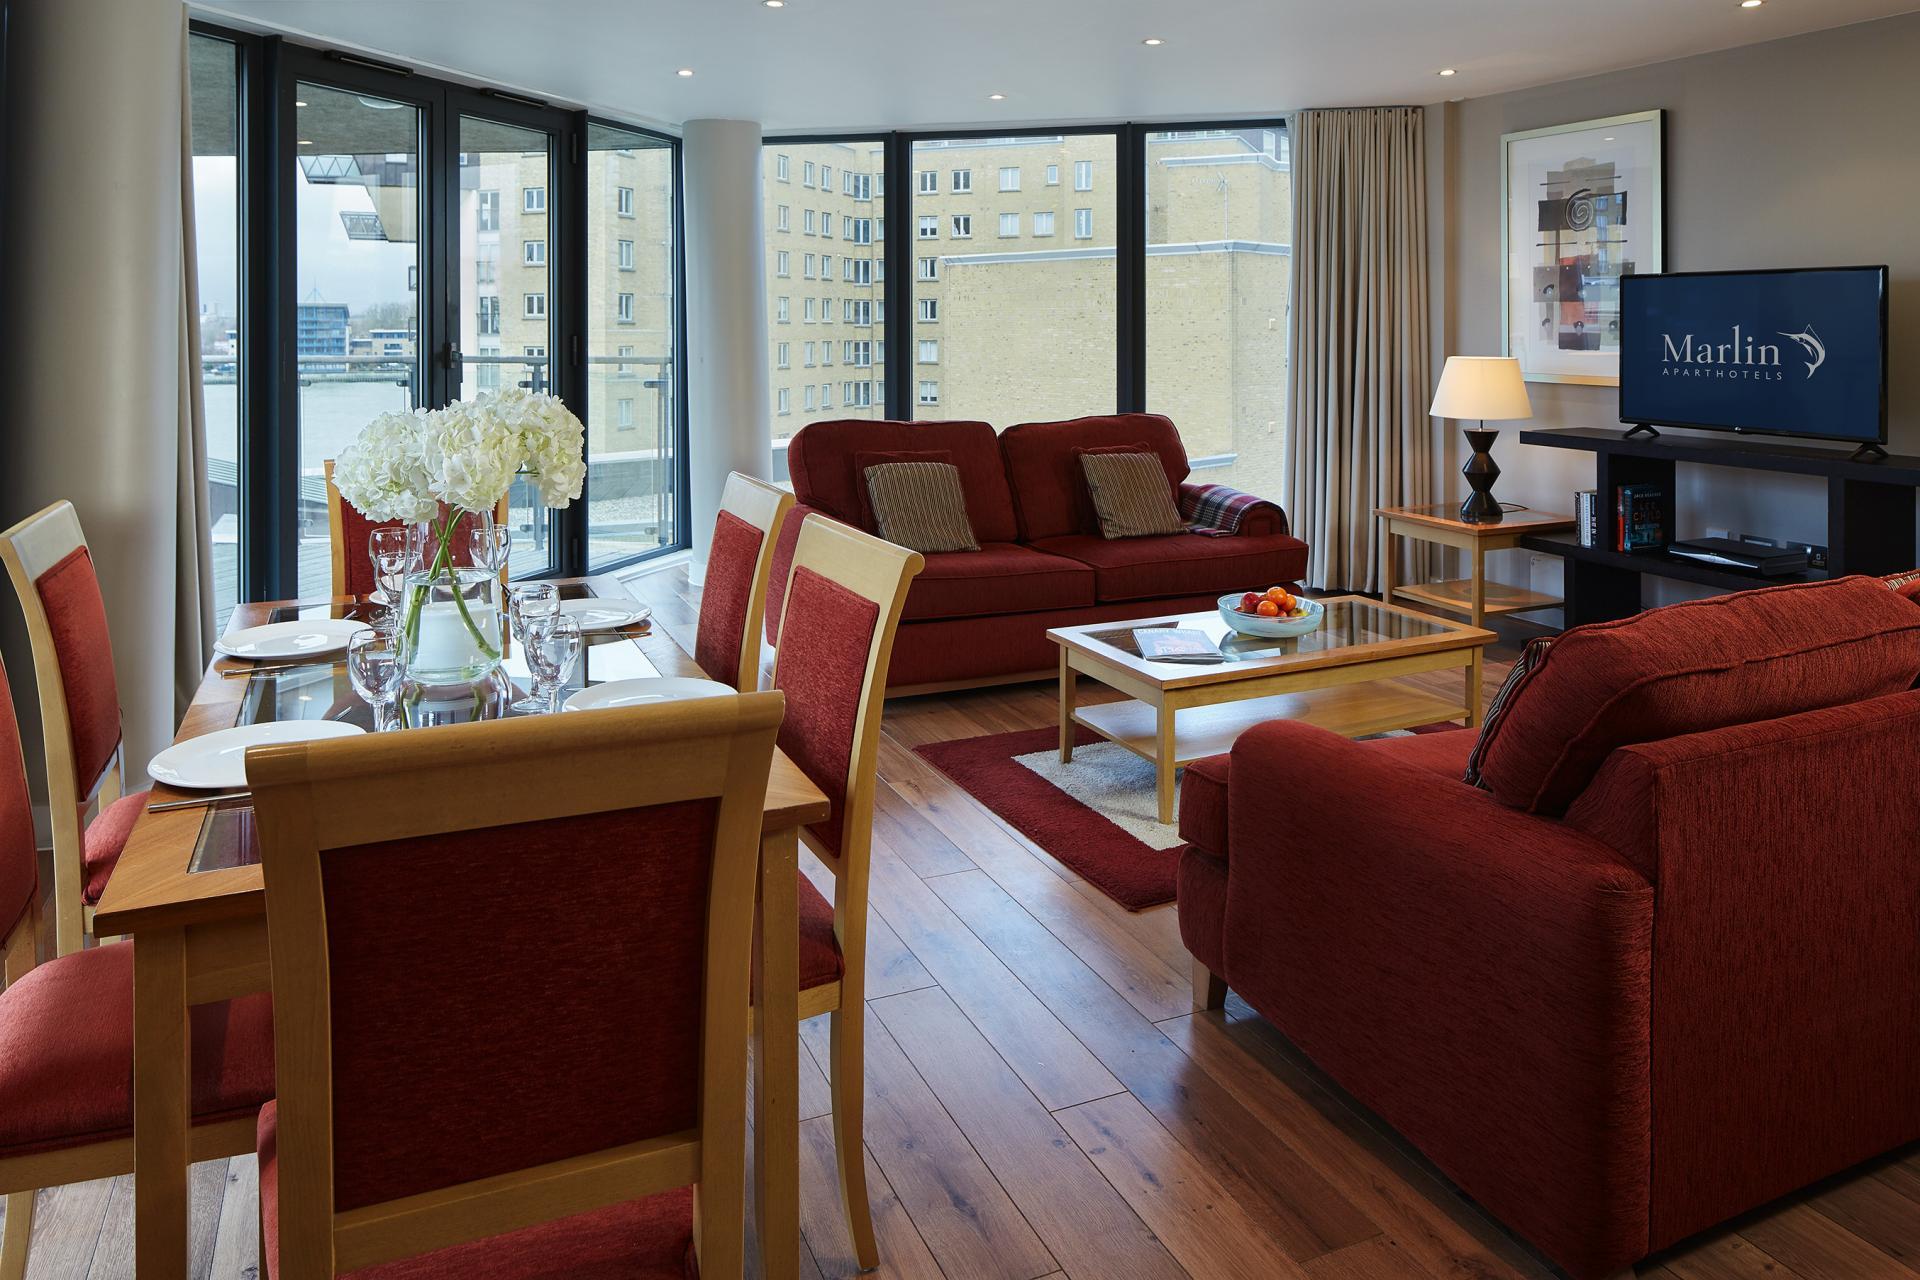 Sofas at Marlin Canary Wharf Apartments, Canary Wharf, London